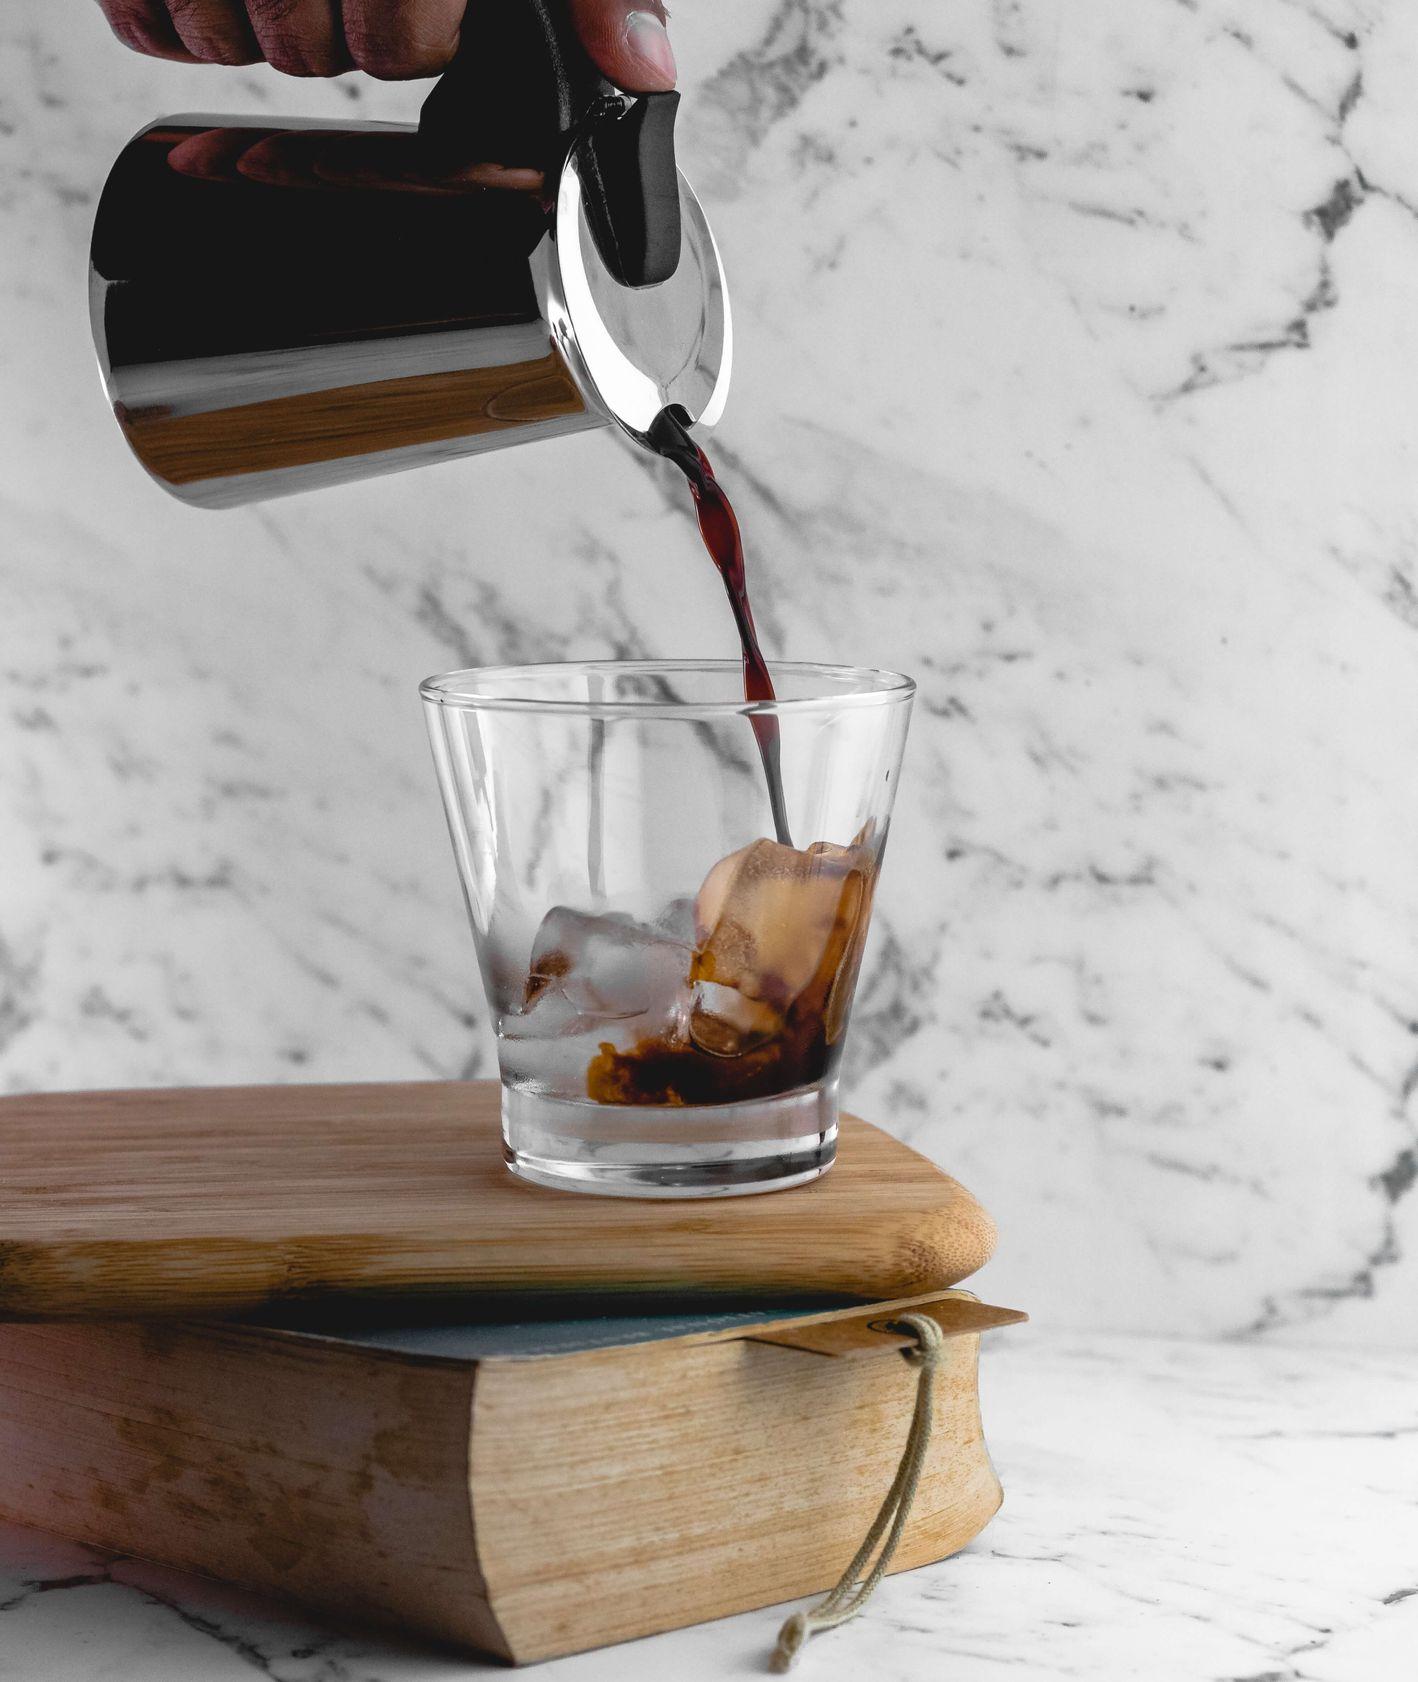 Kawa z kawiarki lana na kostki lodu (fot. Pradeep Javedar / unsplash.com)